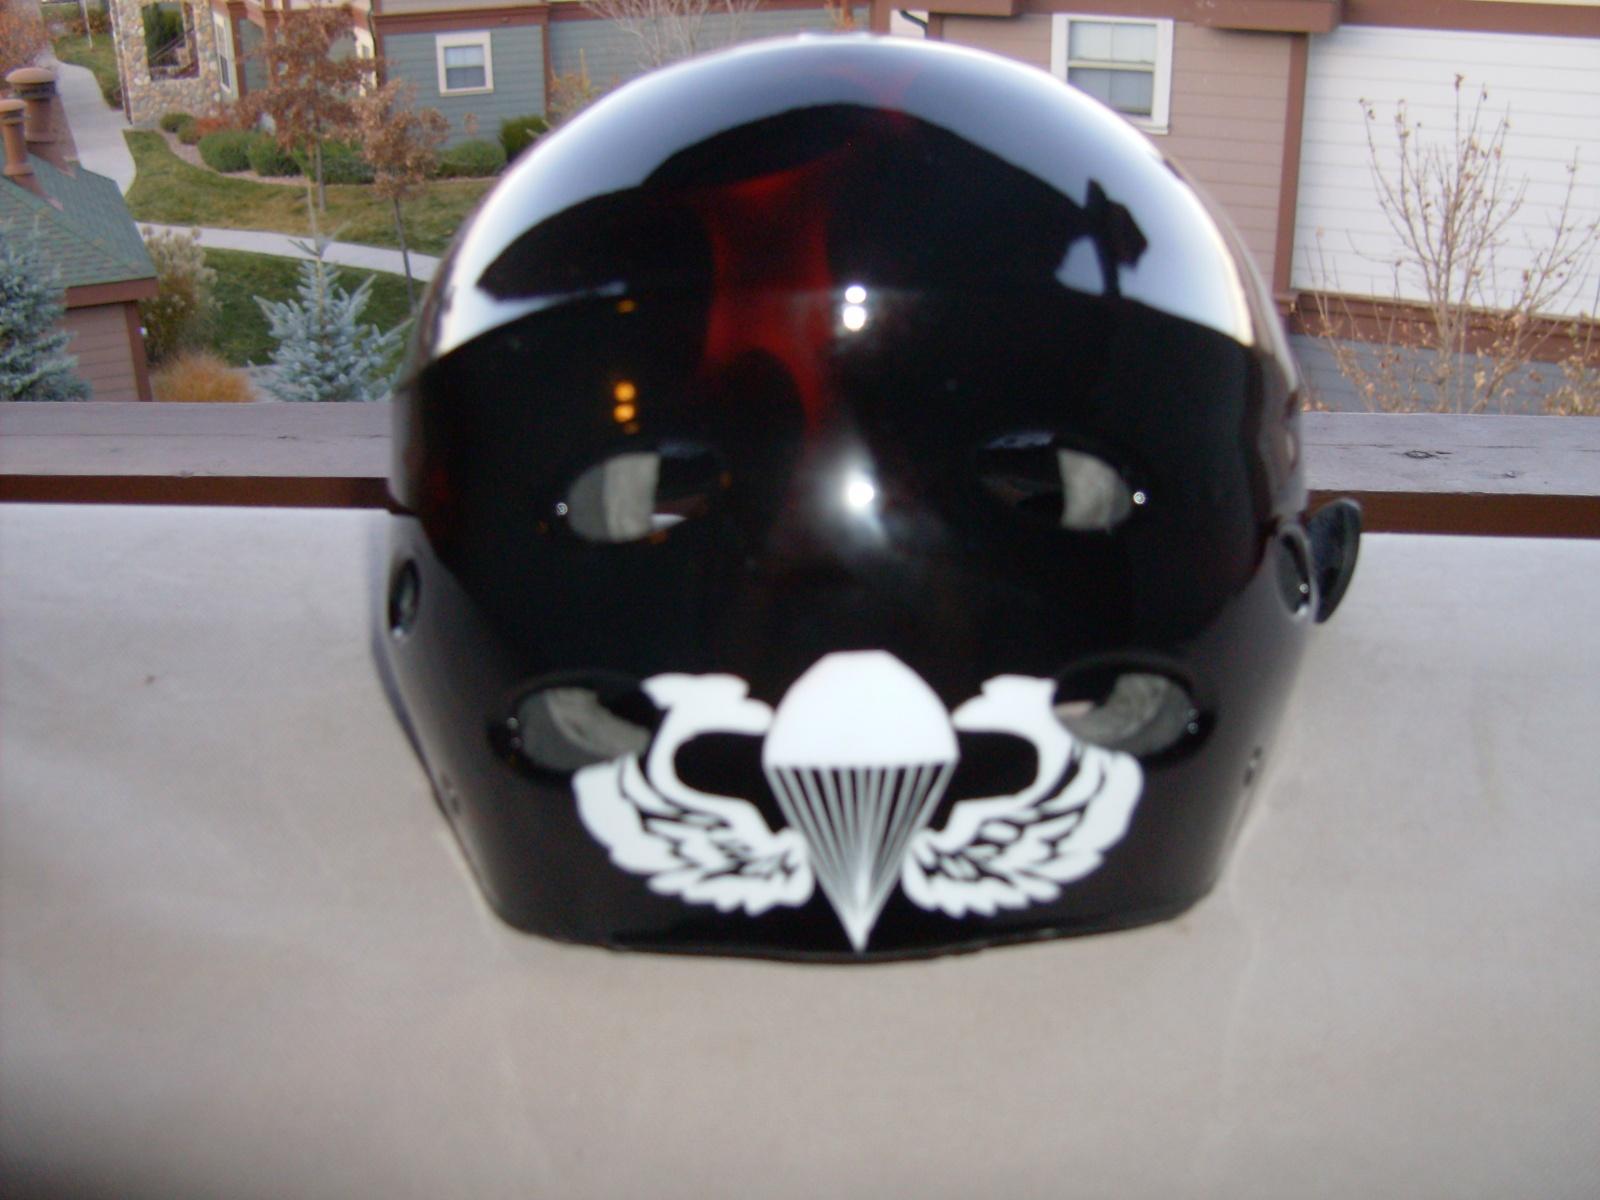 Click image for larger version  Name:Custom kayak helmet 006.jpg Views:230 Size:406.5 KB ID:849